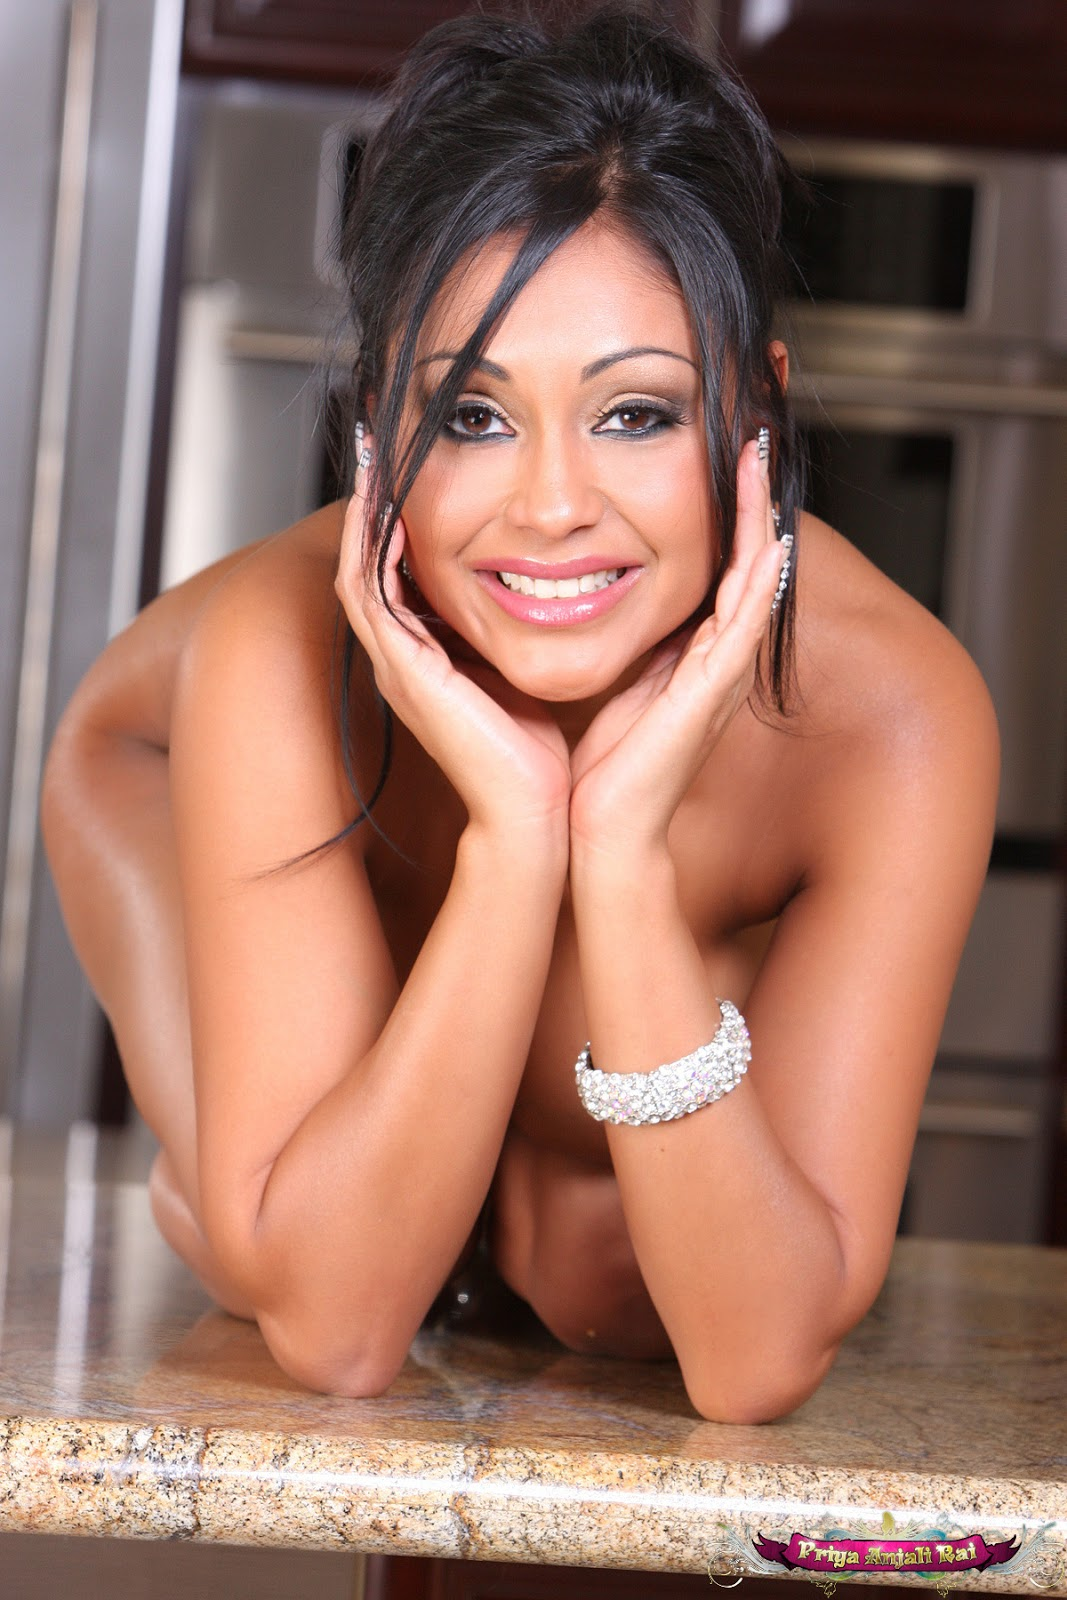 Desi Models 69 Priya Anjali Rai Hot And Sexy Nude Photos-8229